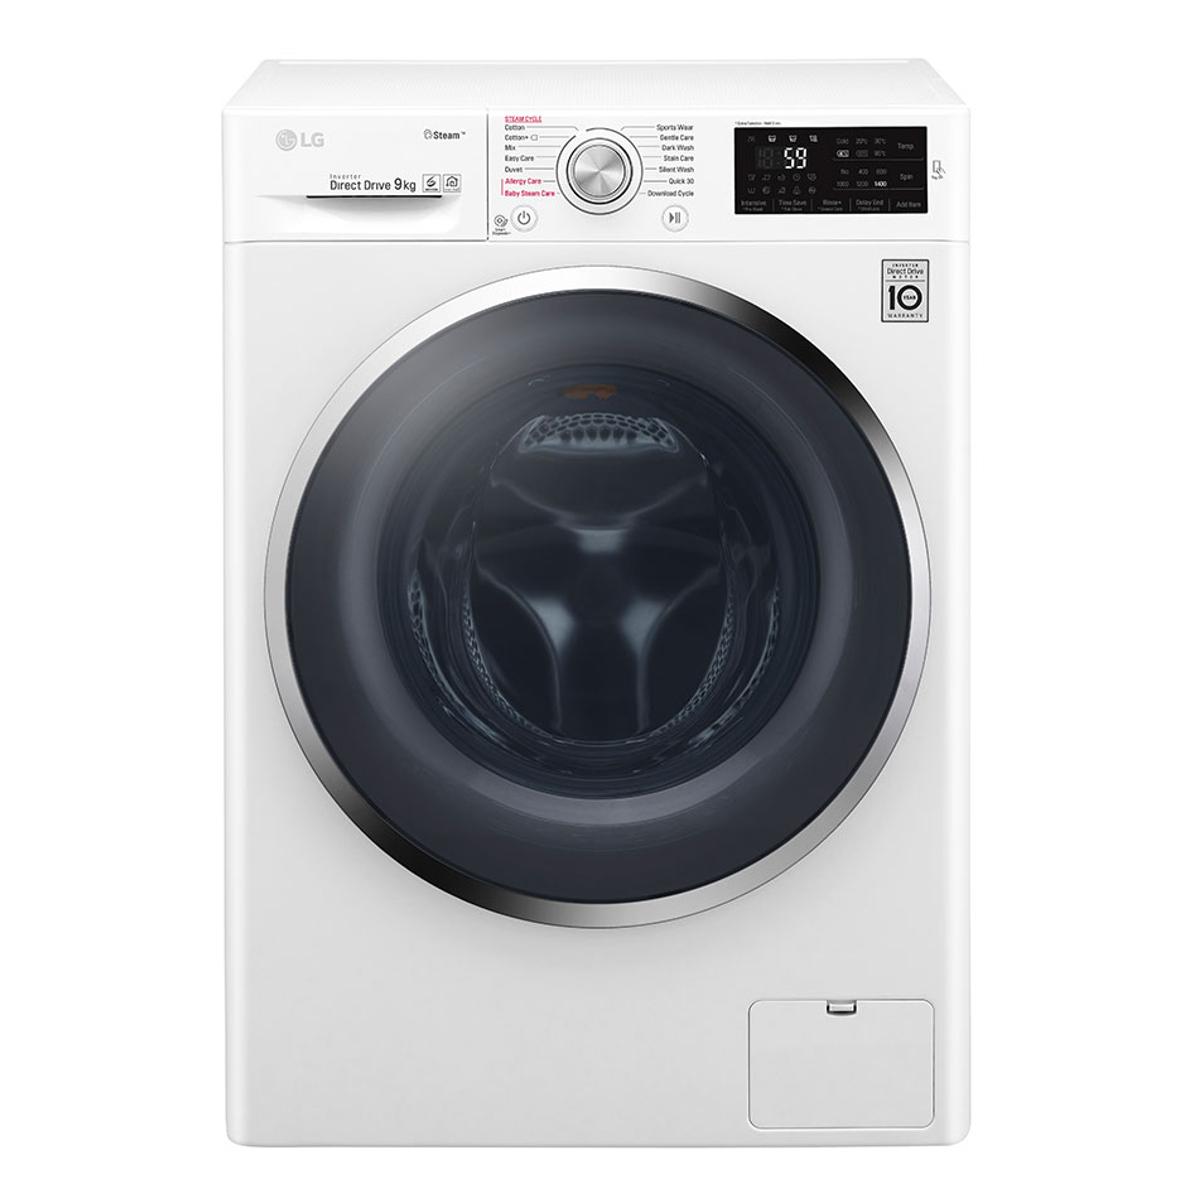 LG F4J6VY2W 9kg Washing Machine White + 5 year Guarantee £359.10 w/ code @ Hughes